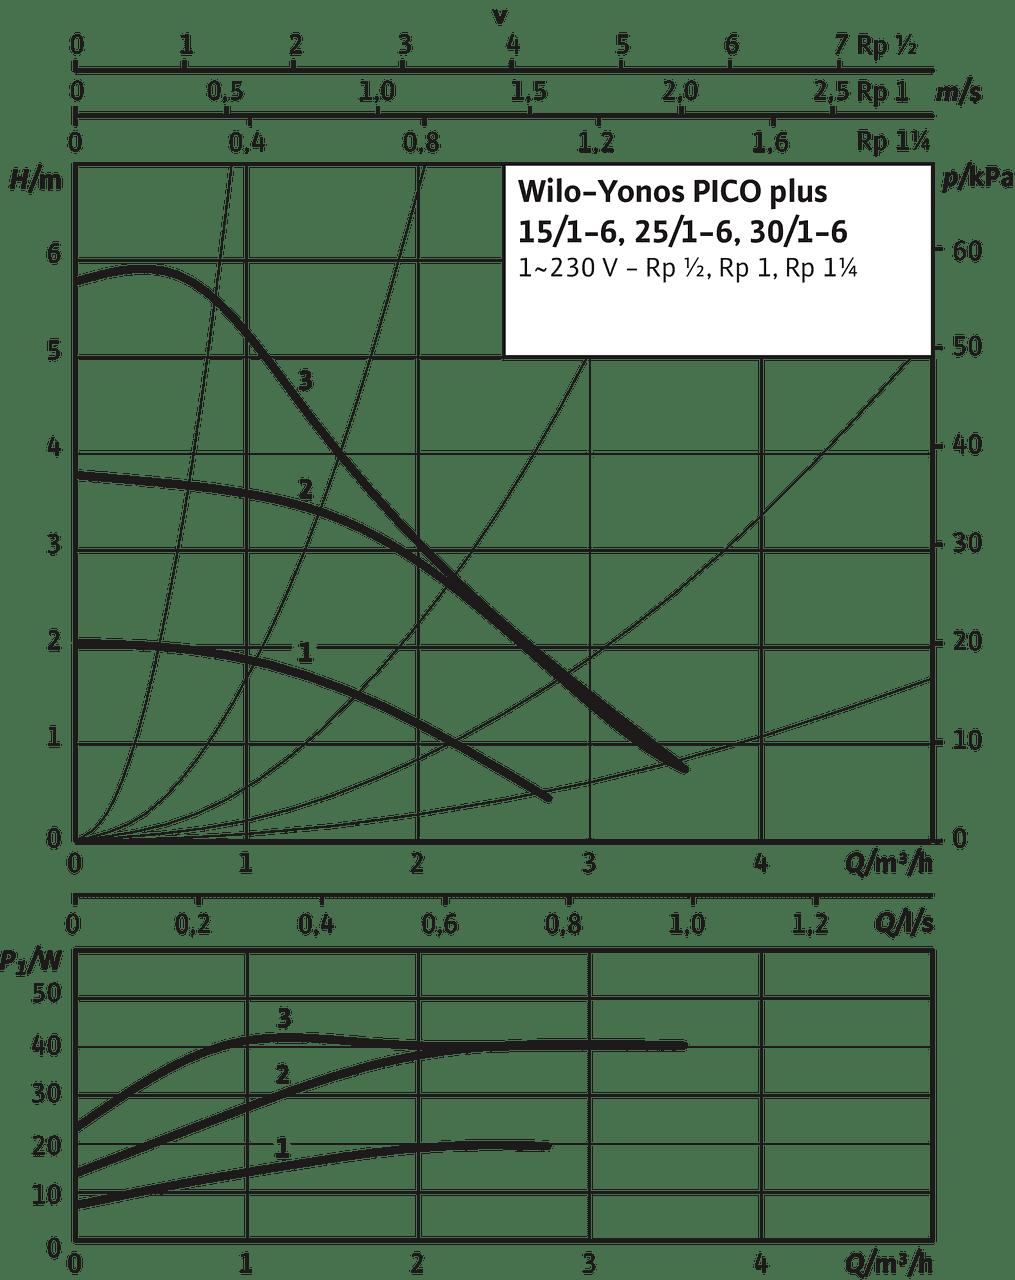 Yonos PICO Plus 25/1-6